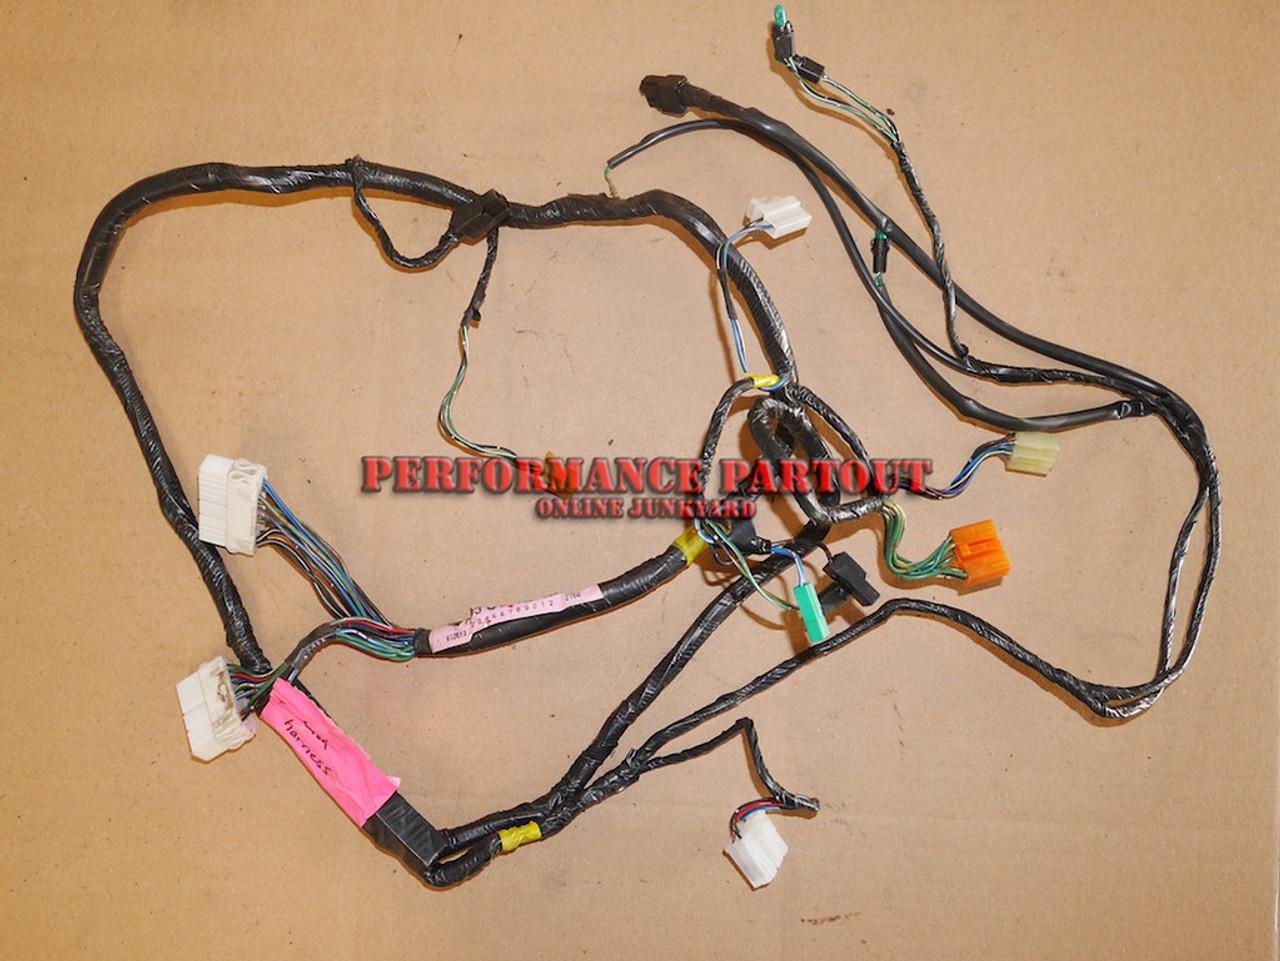 dashboard wiring harness galant vr4dashboard wiring harness 18 [ 1280 x 961 Pixel ]